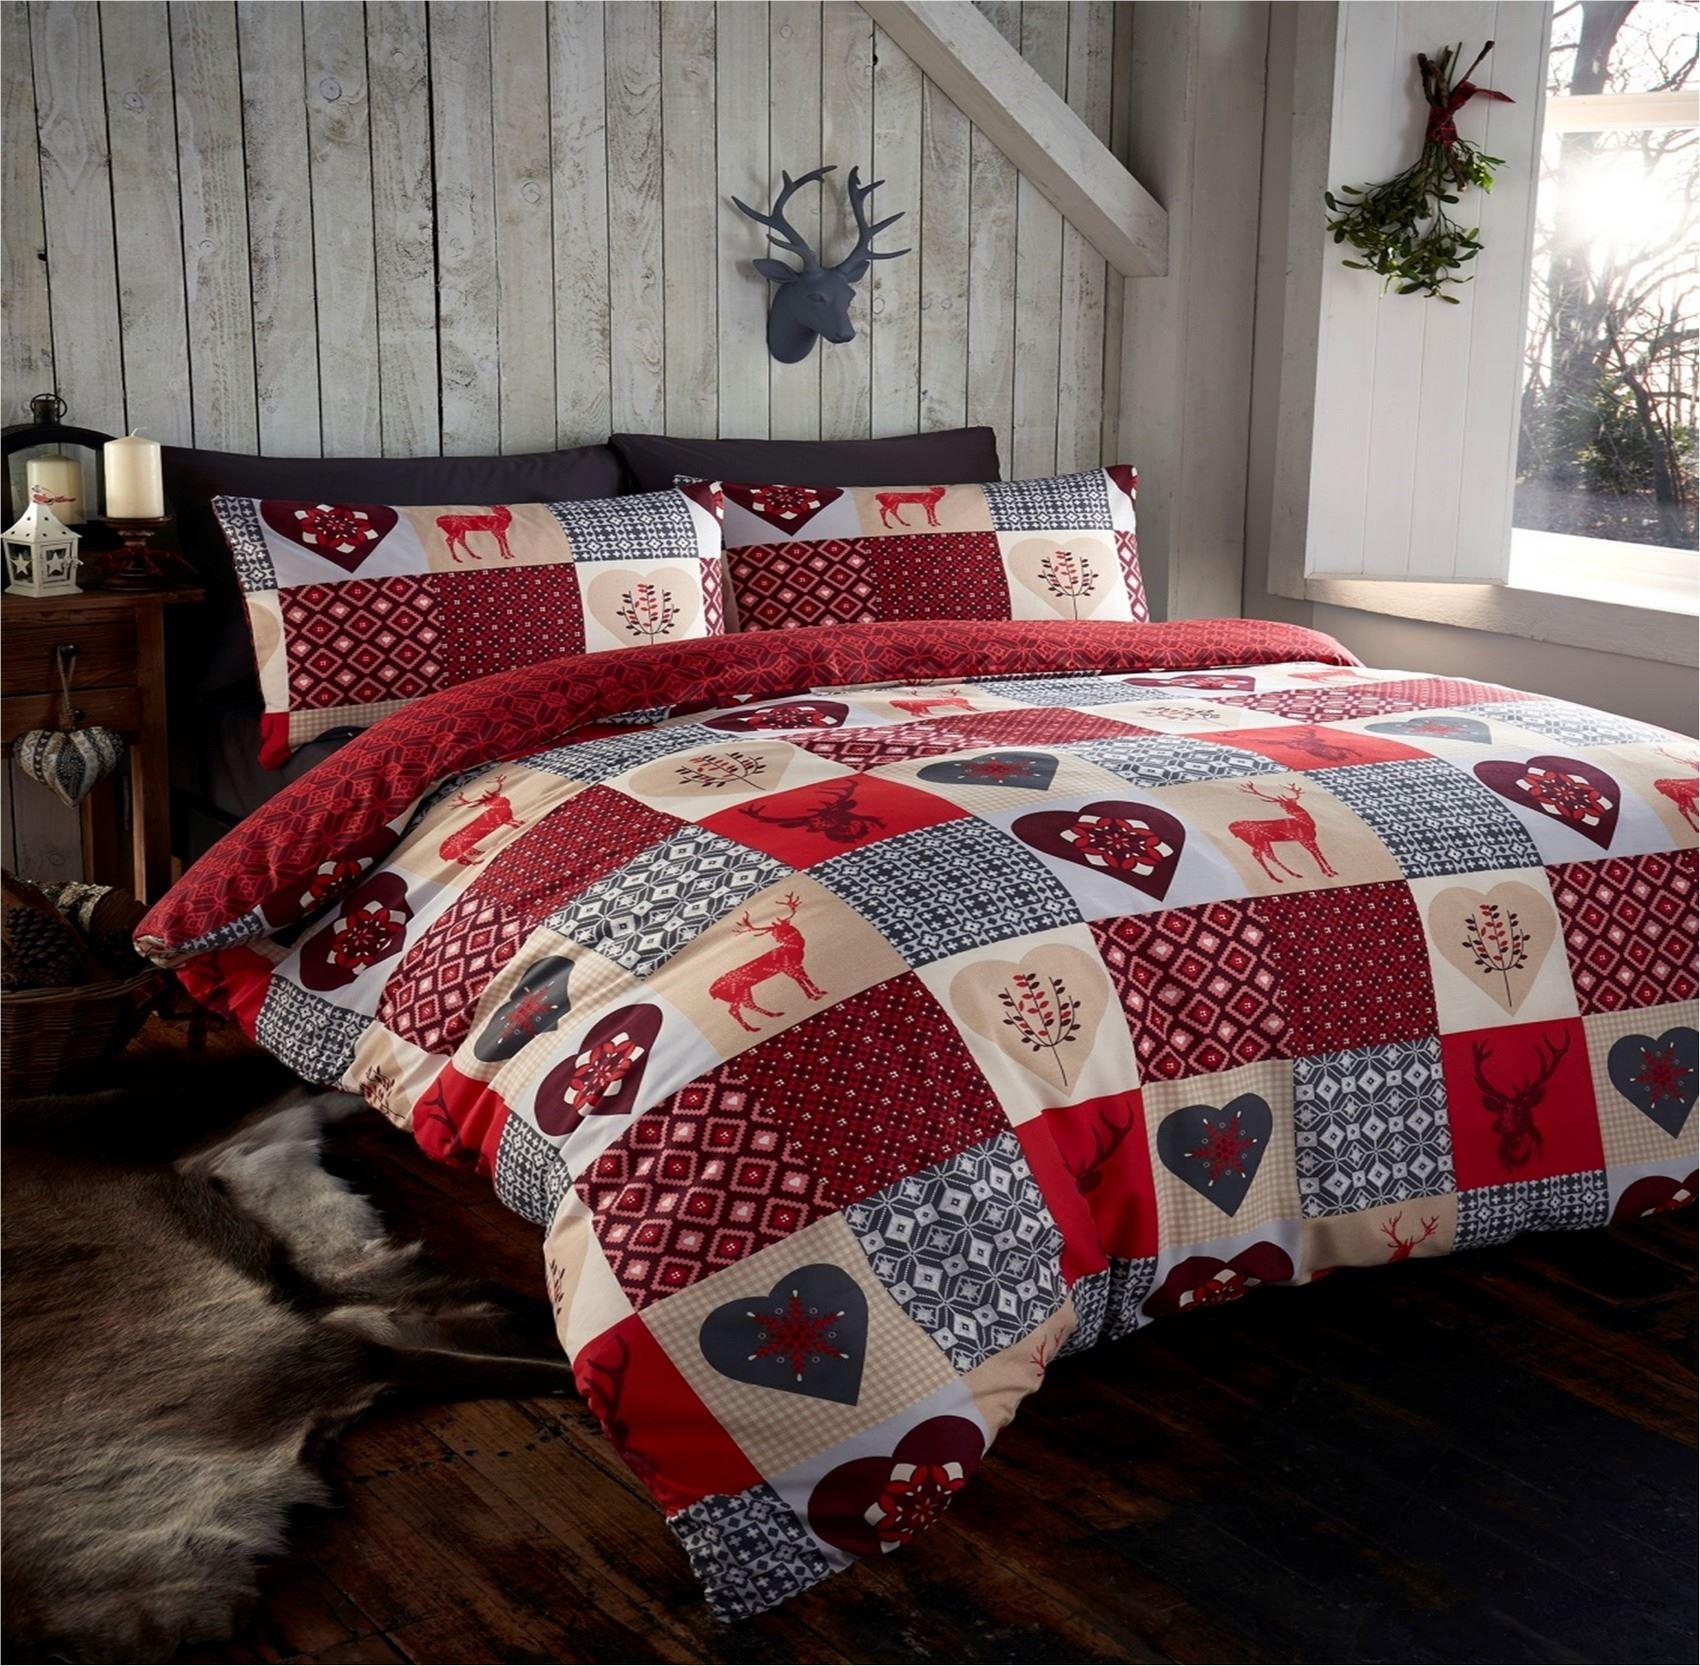 stag duvet cover pillowcase quilt cover bedding bed sets. Black Bedroom Furniture Sets. Home Design Ideas